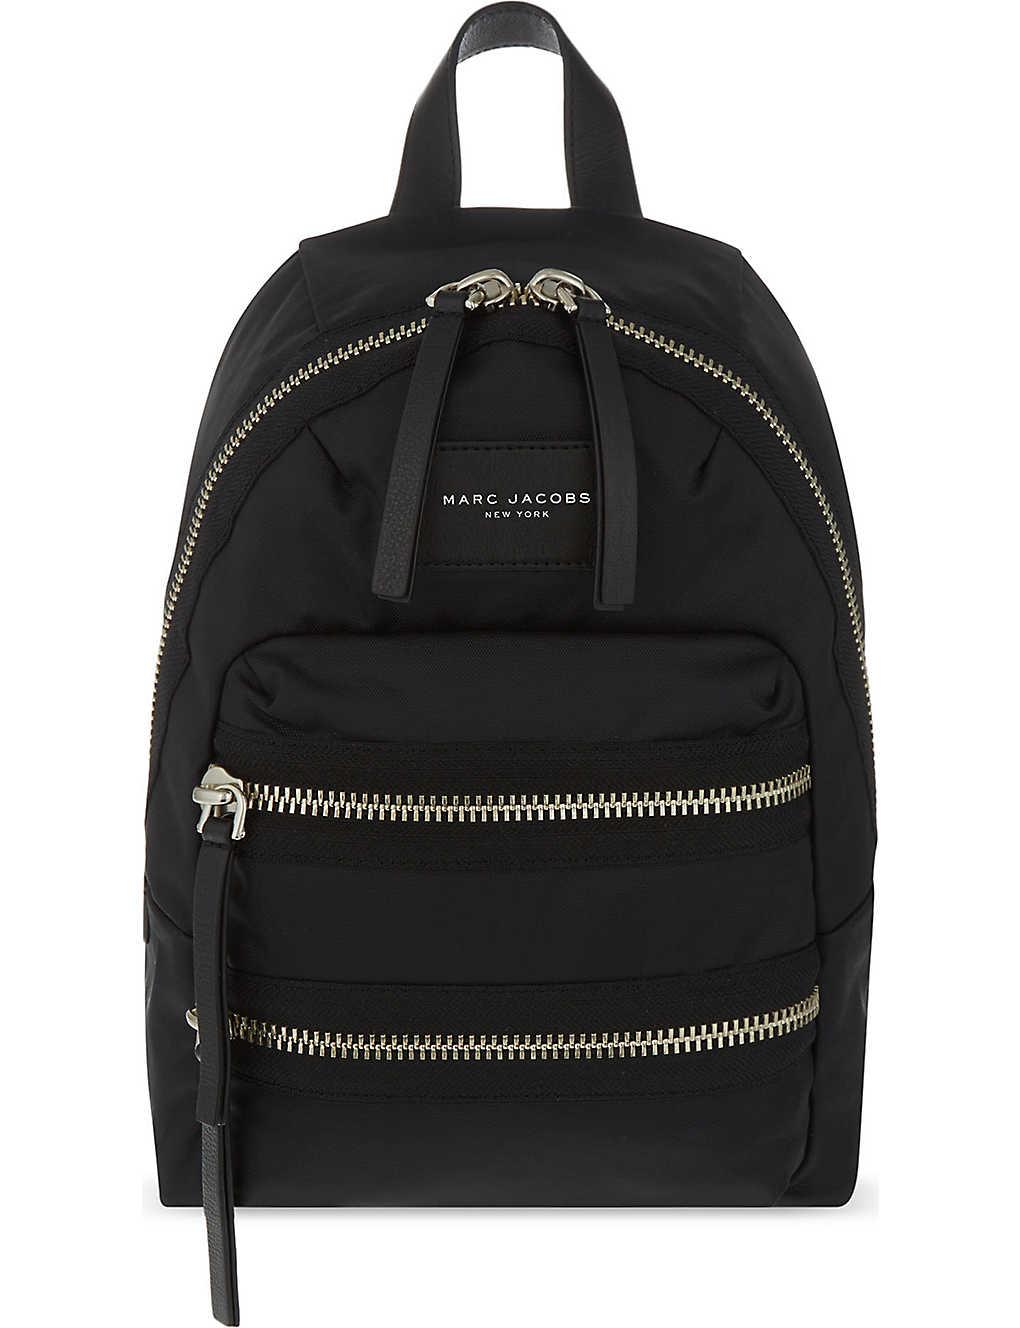 9383185f5 MARC JACOBS - Biker nylon mini backpack | Selfridges.com